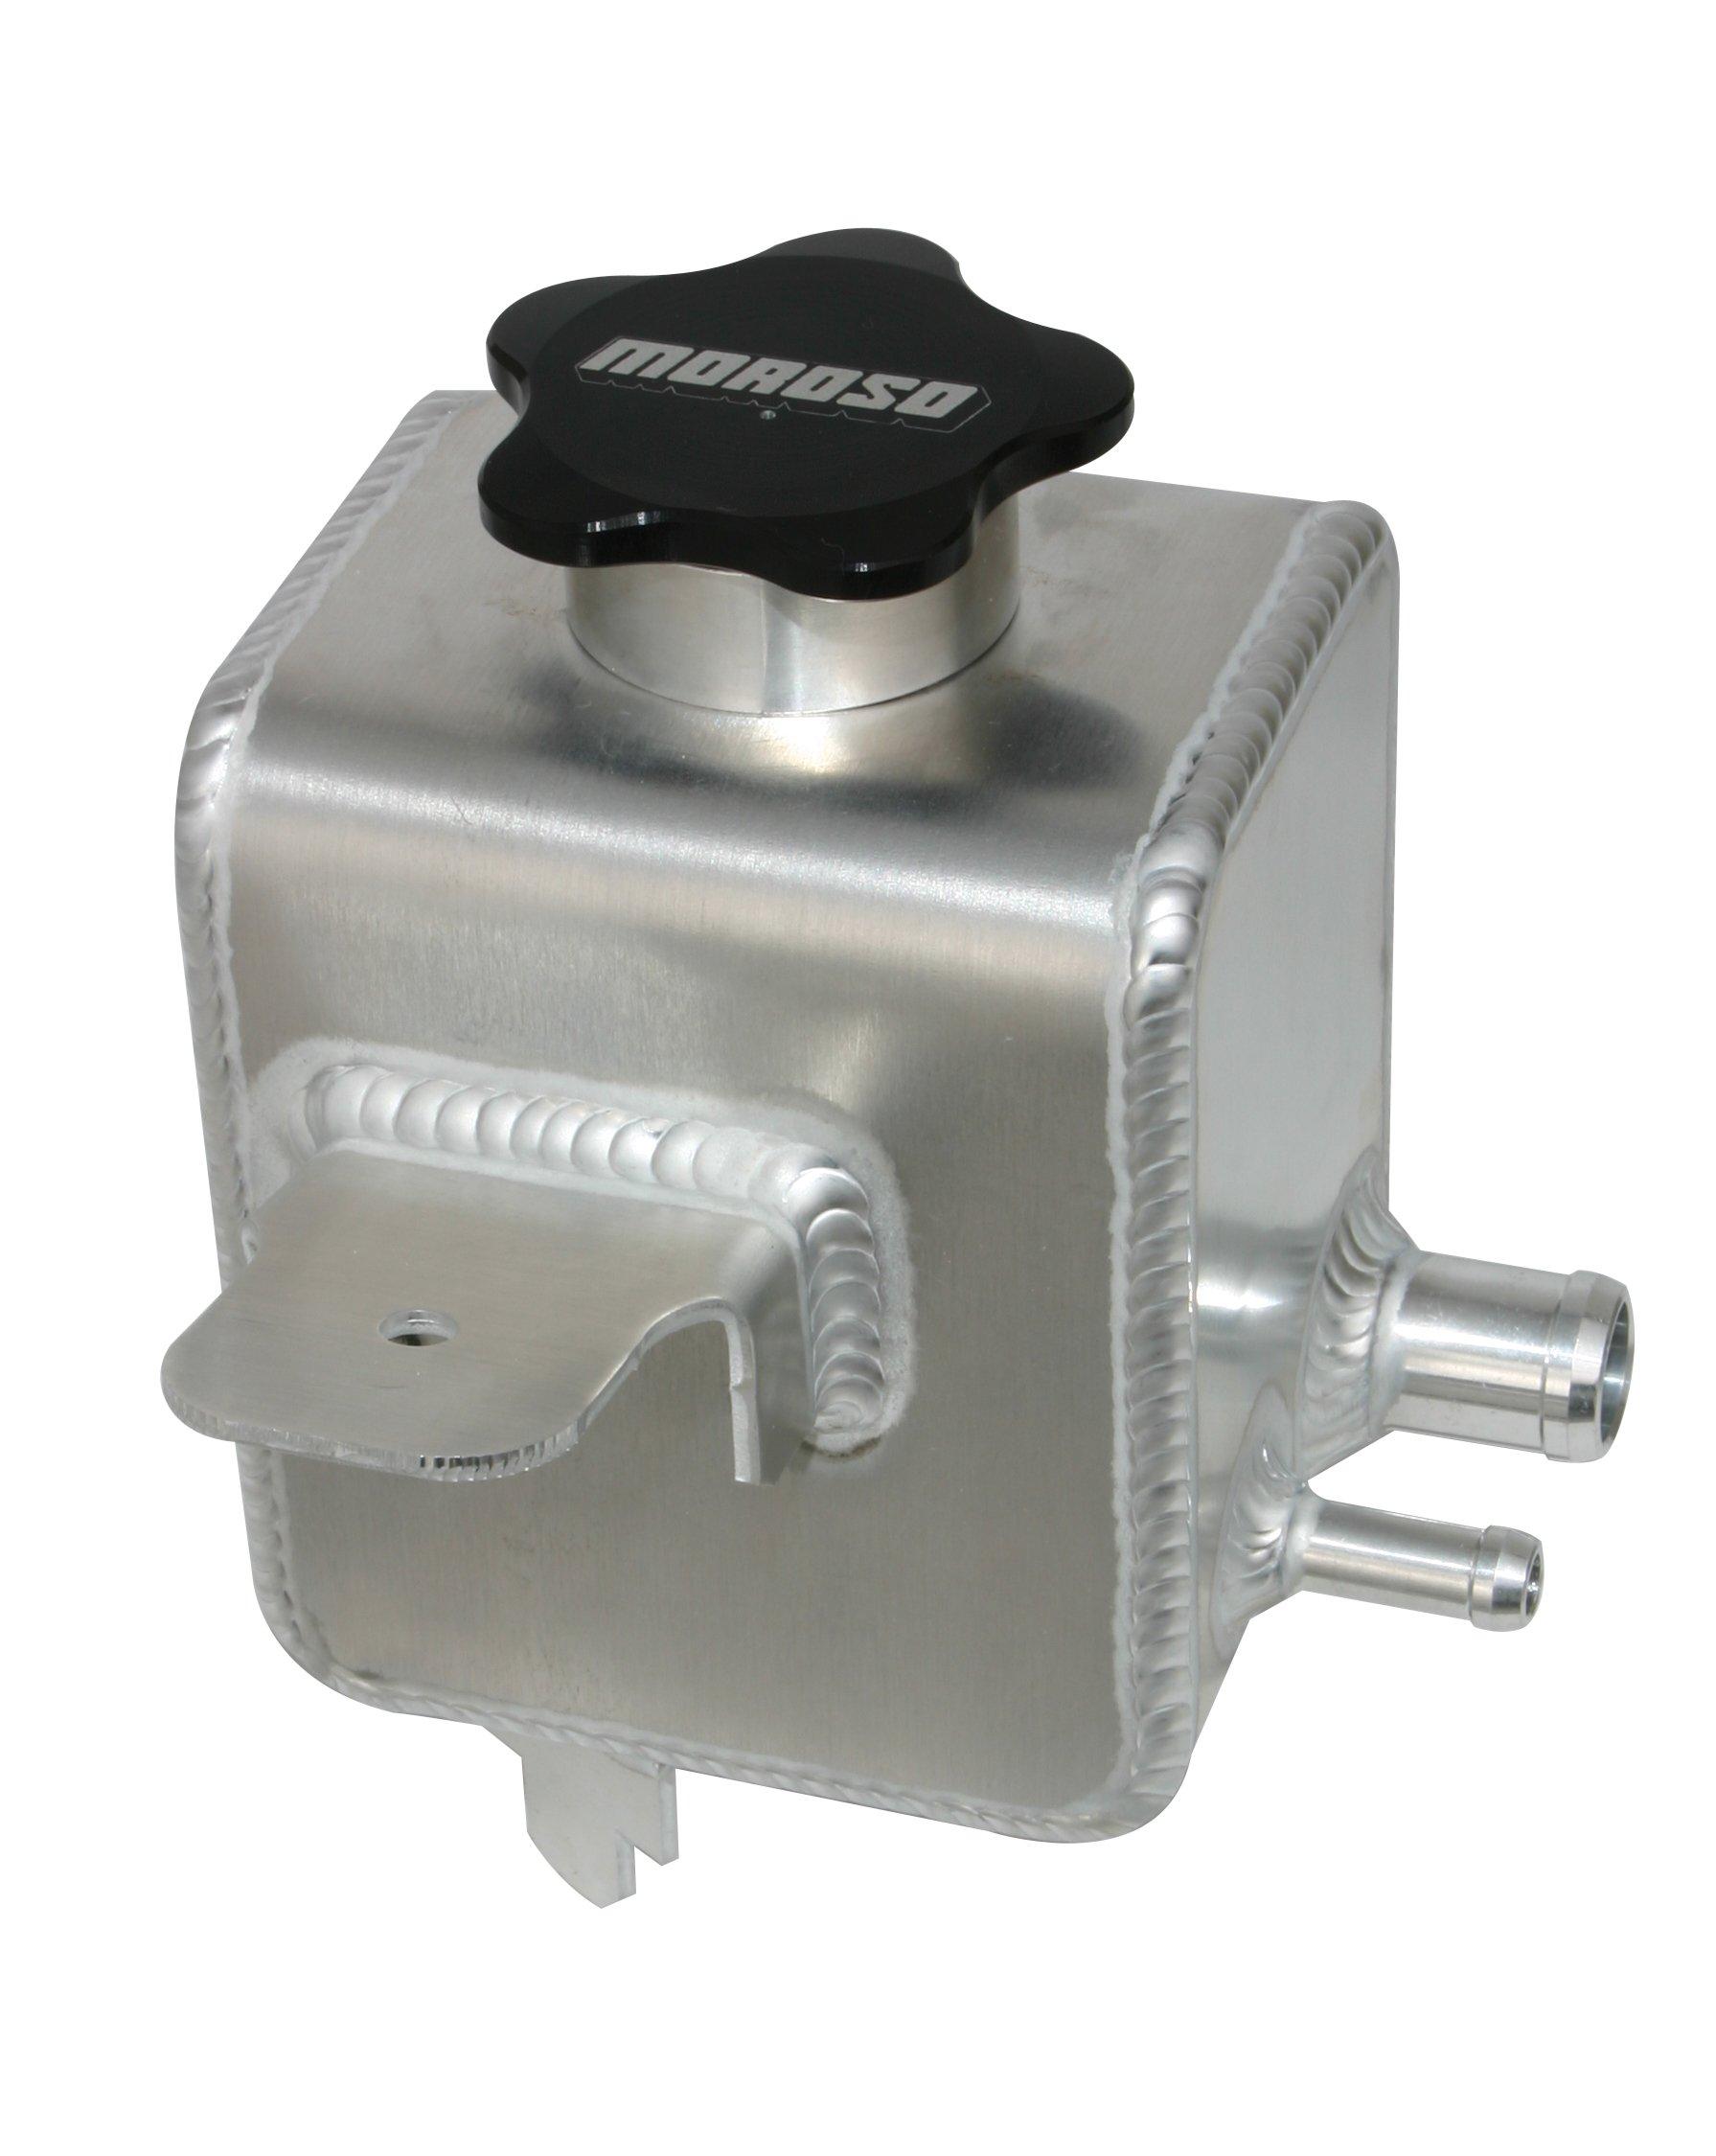 Moroso 63501 Power Steering Tank for GT 500 by Moroso (Image #1)